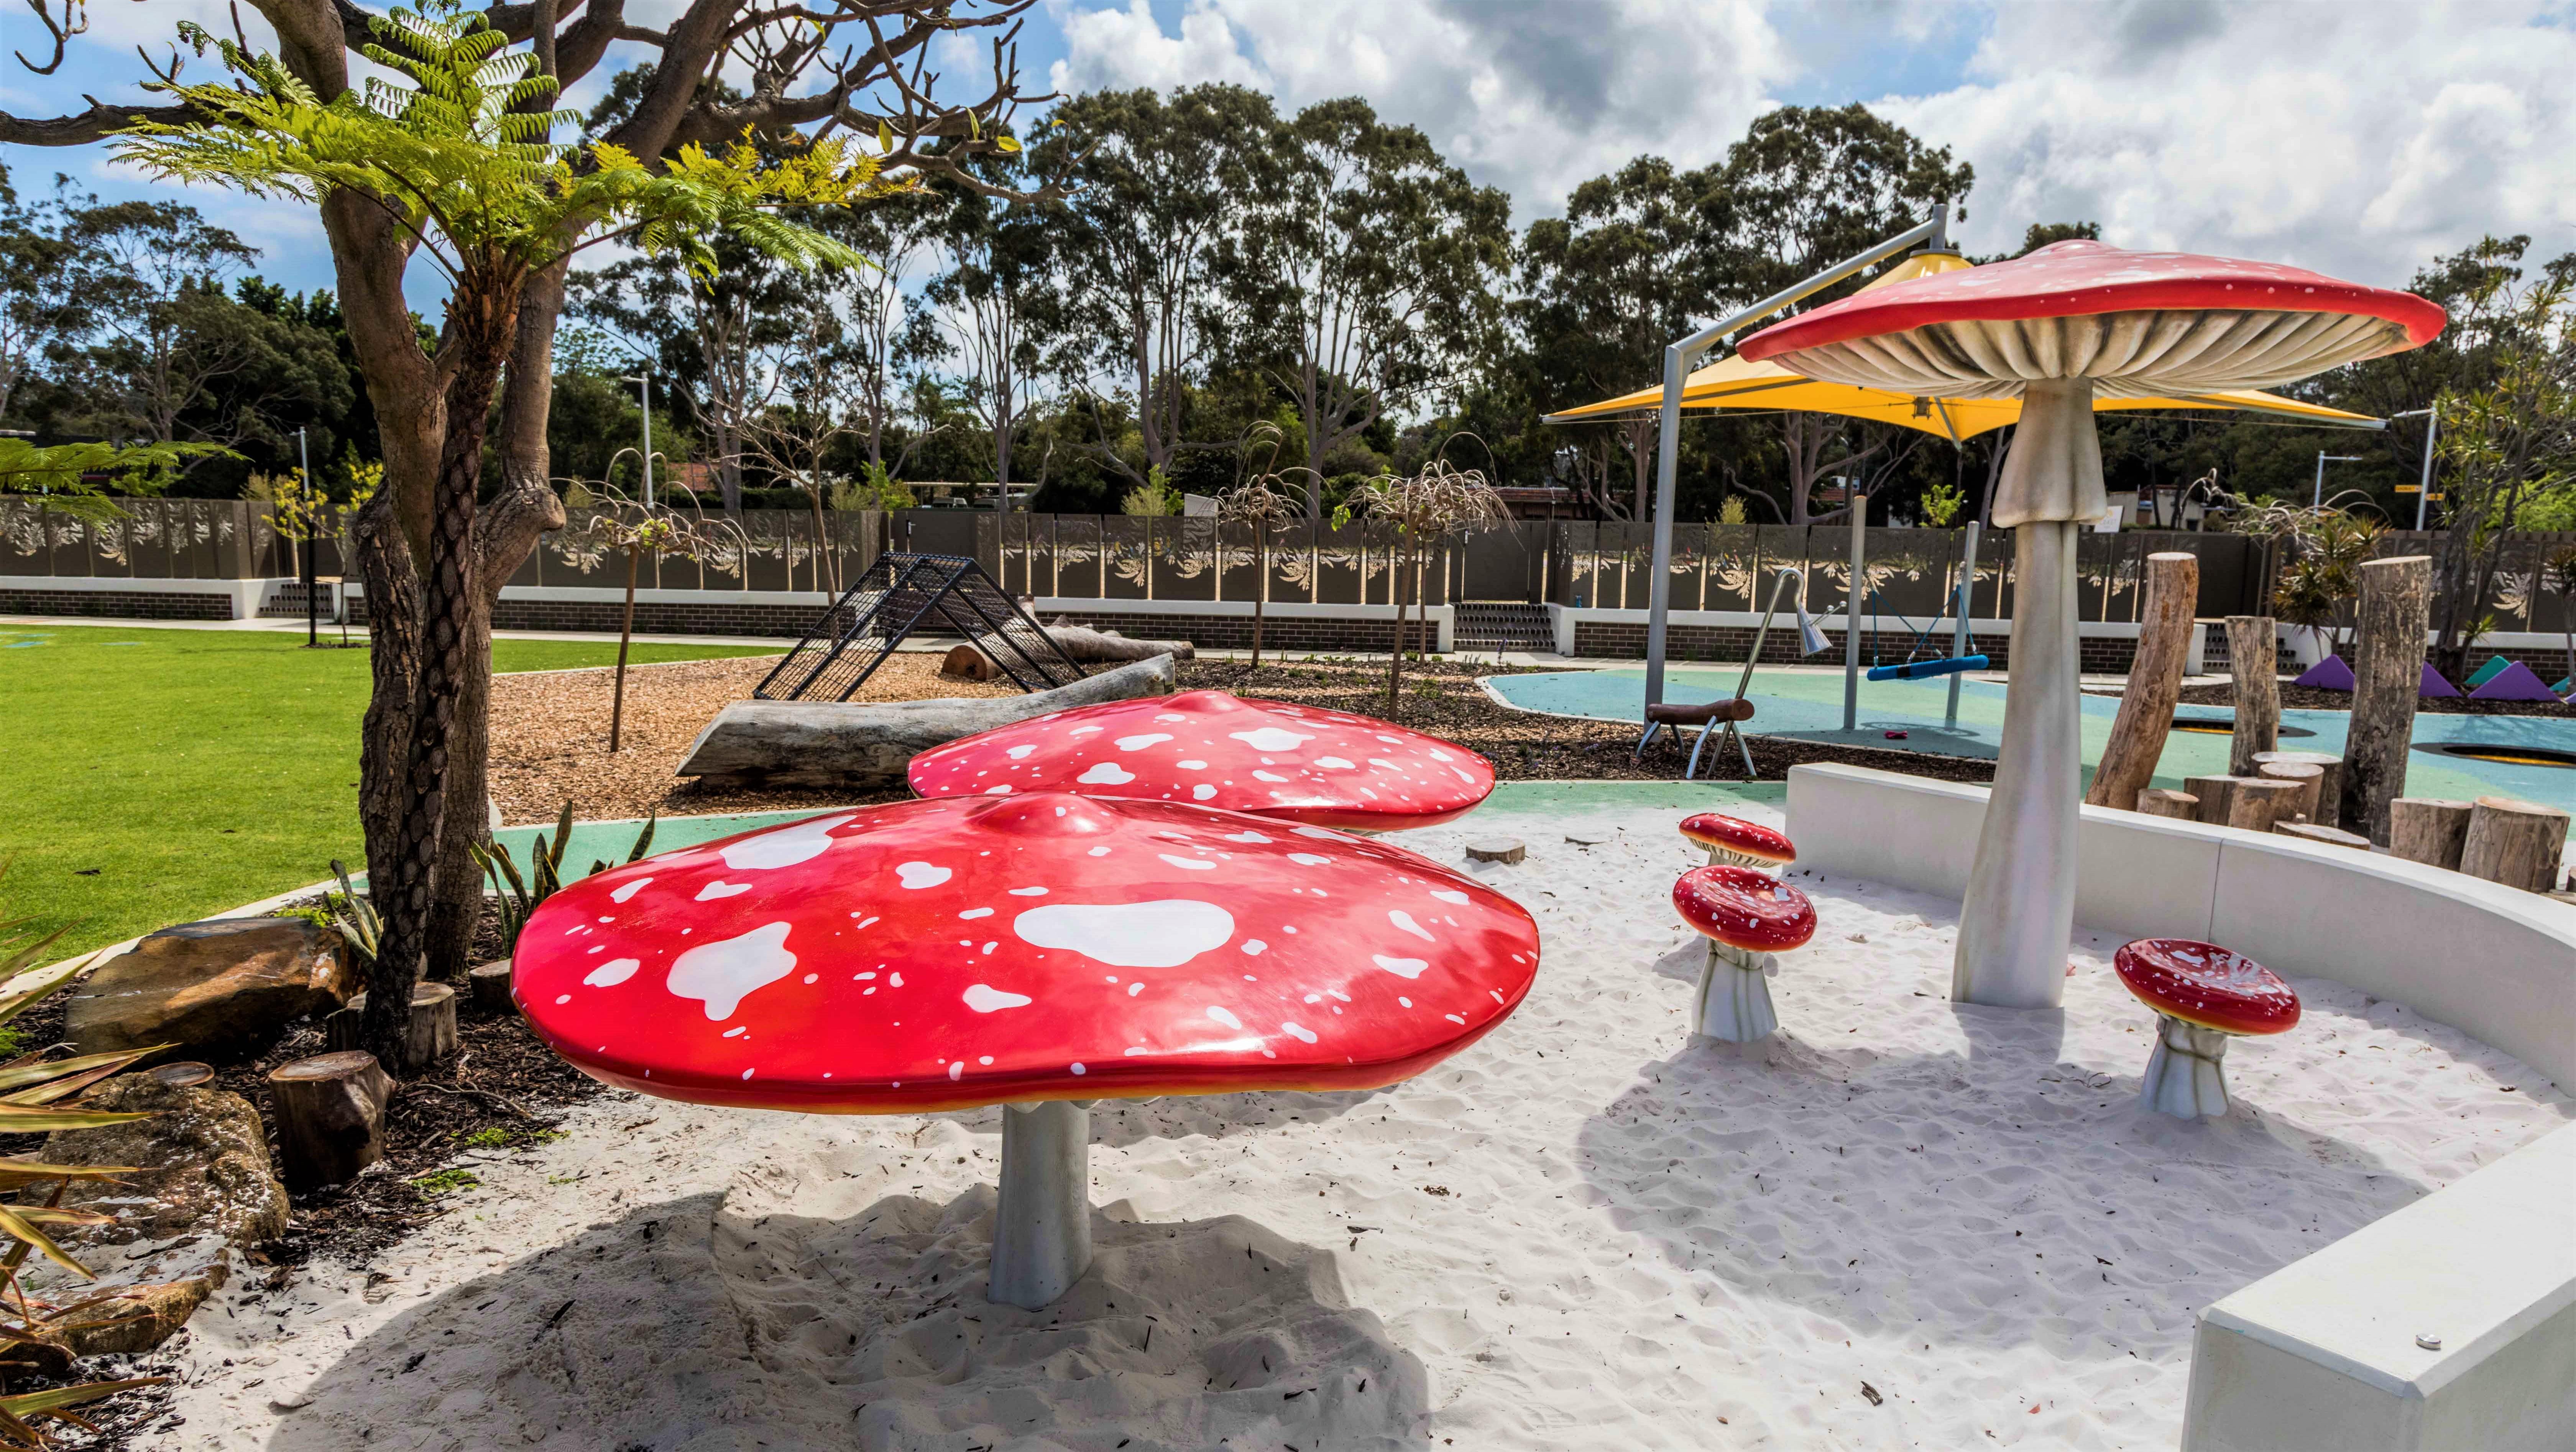 Montario Quarter - Mushroom Art Playground